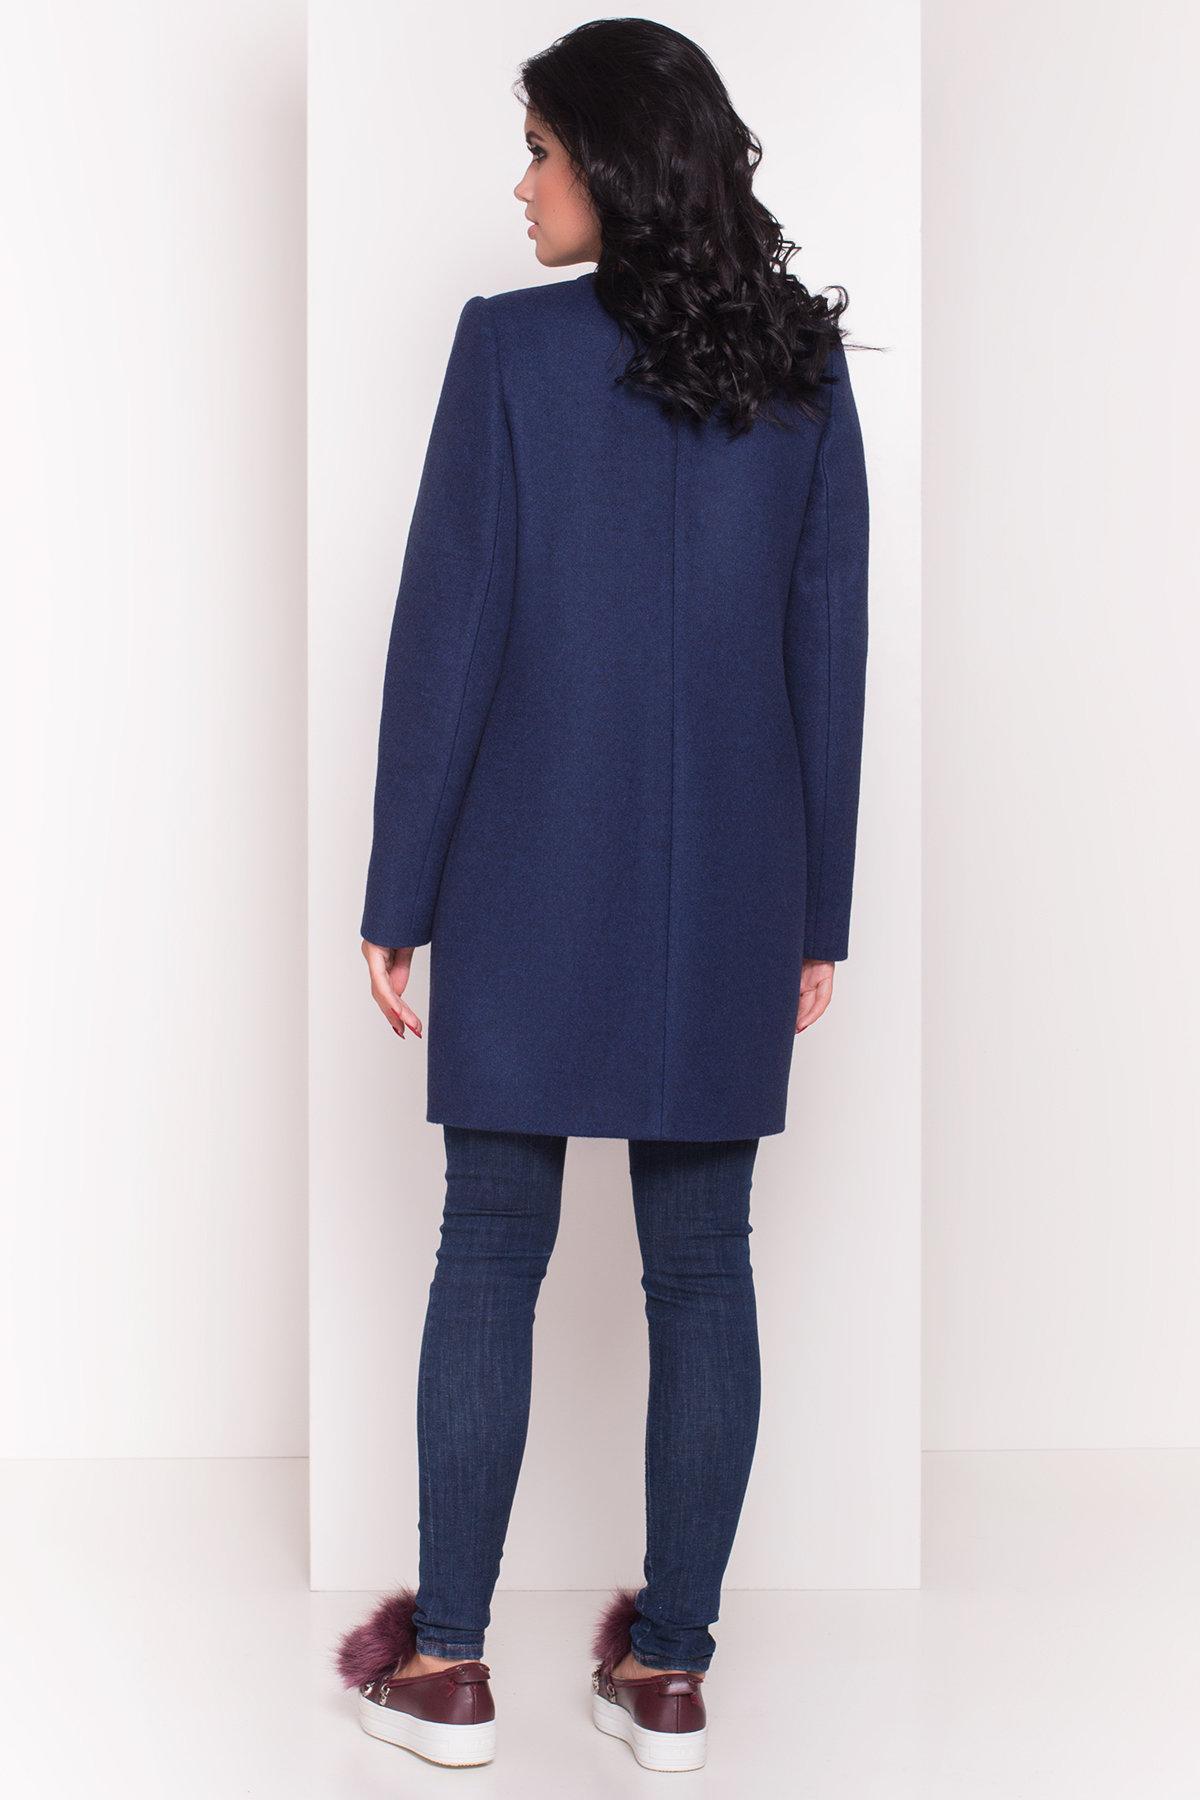 Демисезонное пальто Ферран 5369 АРТ. 36546 Цвет: Темно-синий 17 - фото 3, интернет магазин tm-modus.ru